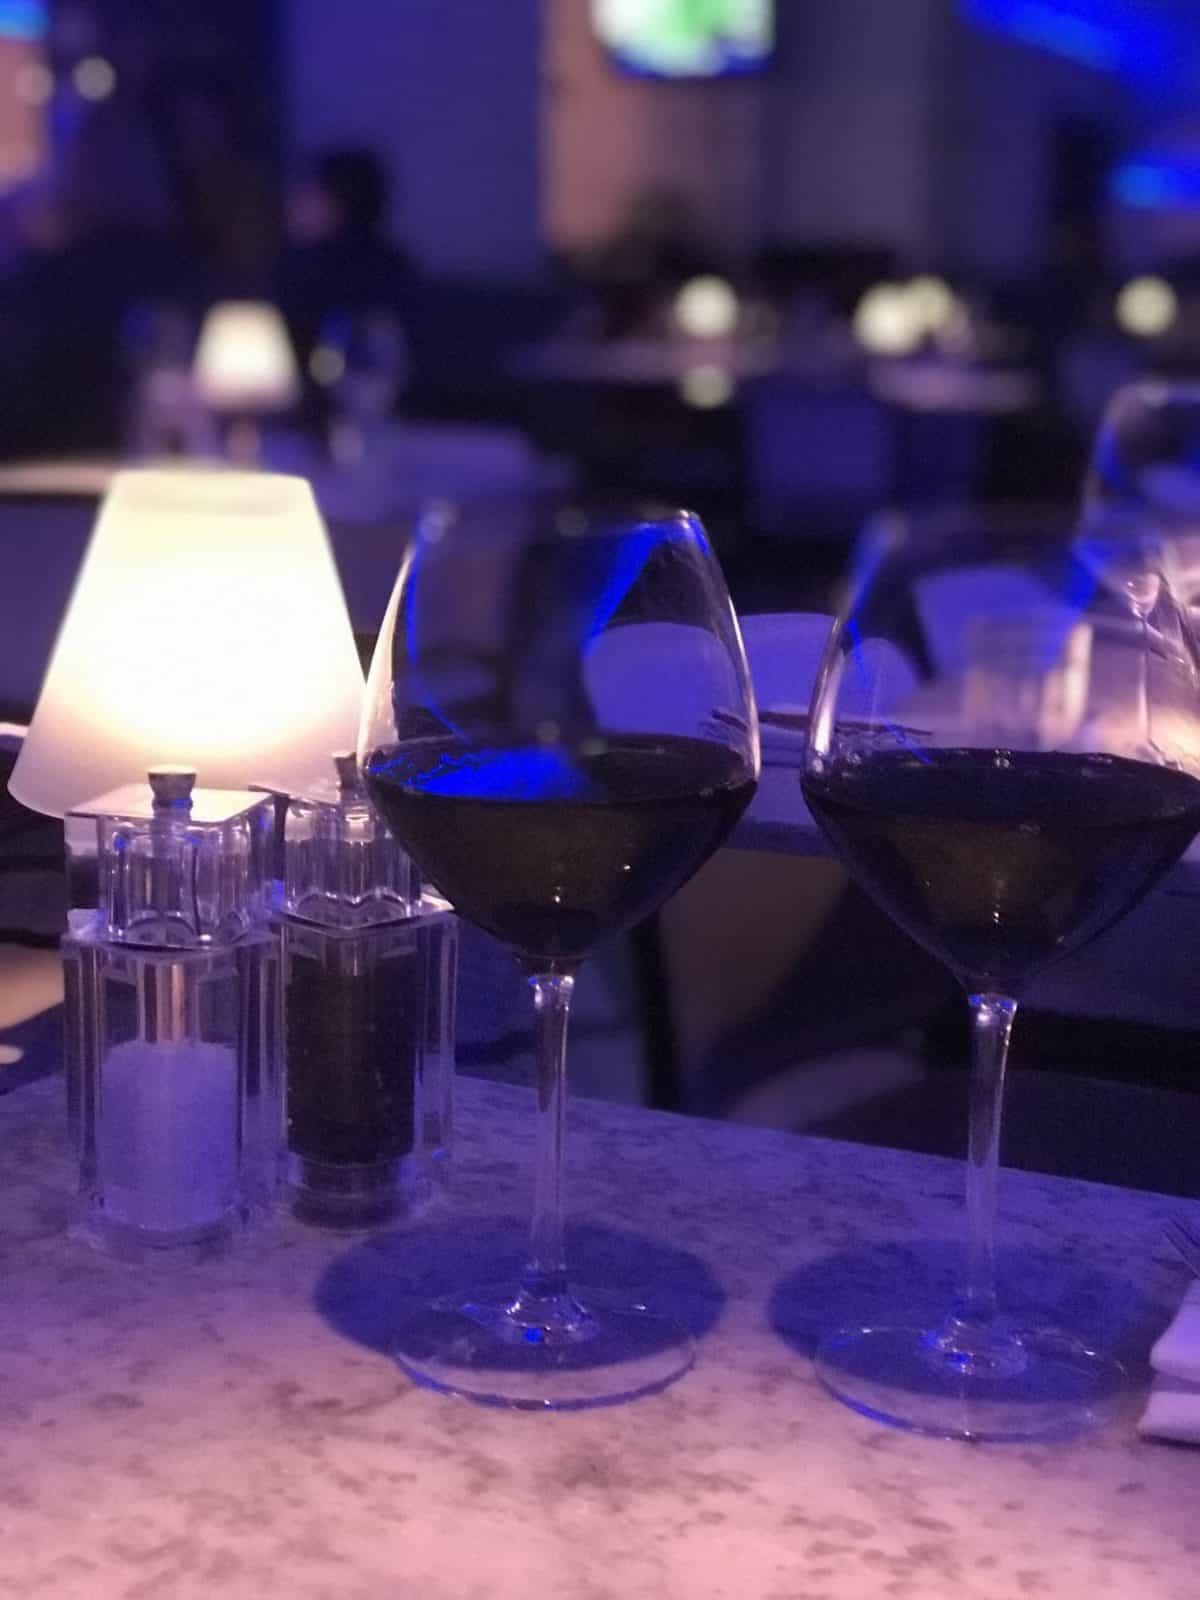 Alston bar and beef Glasgow wine